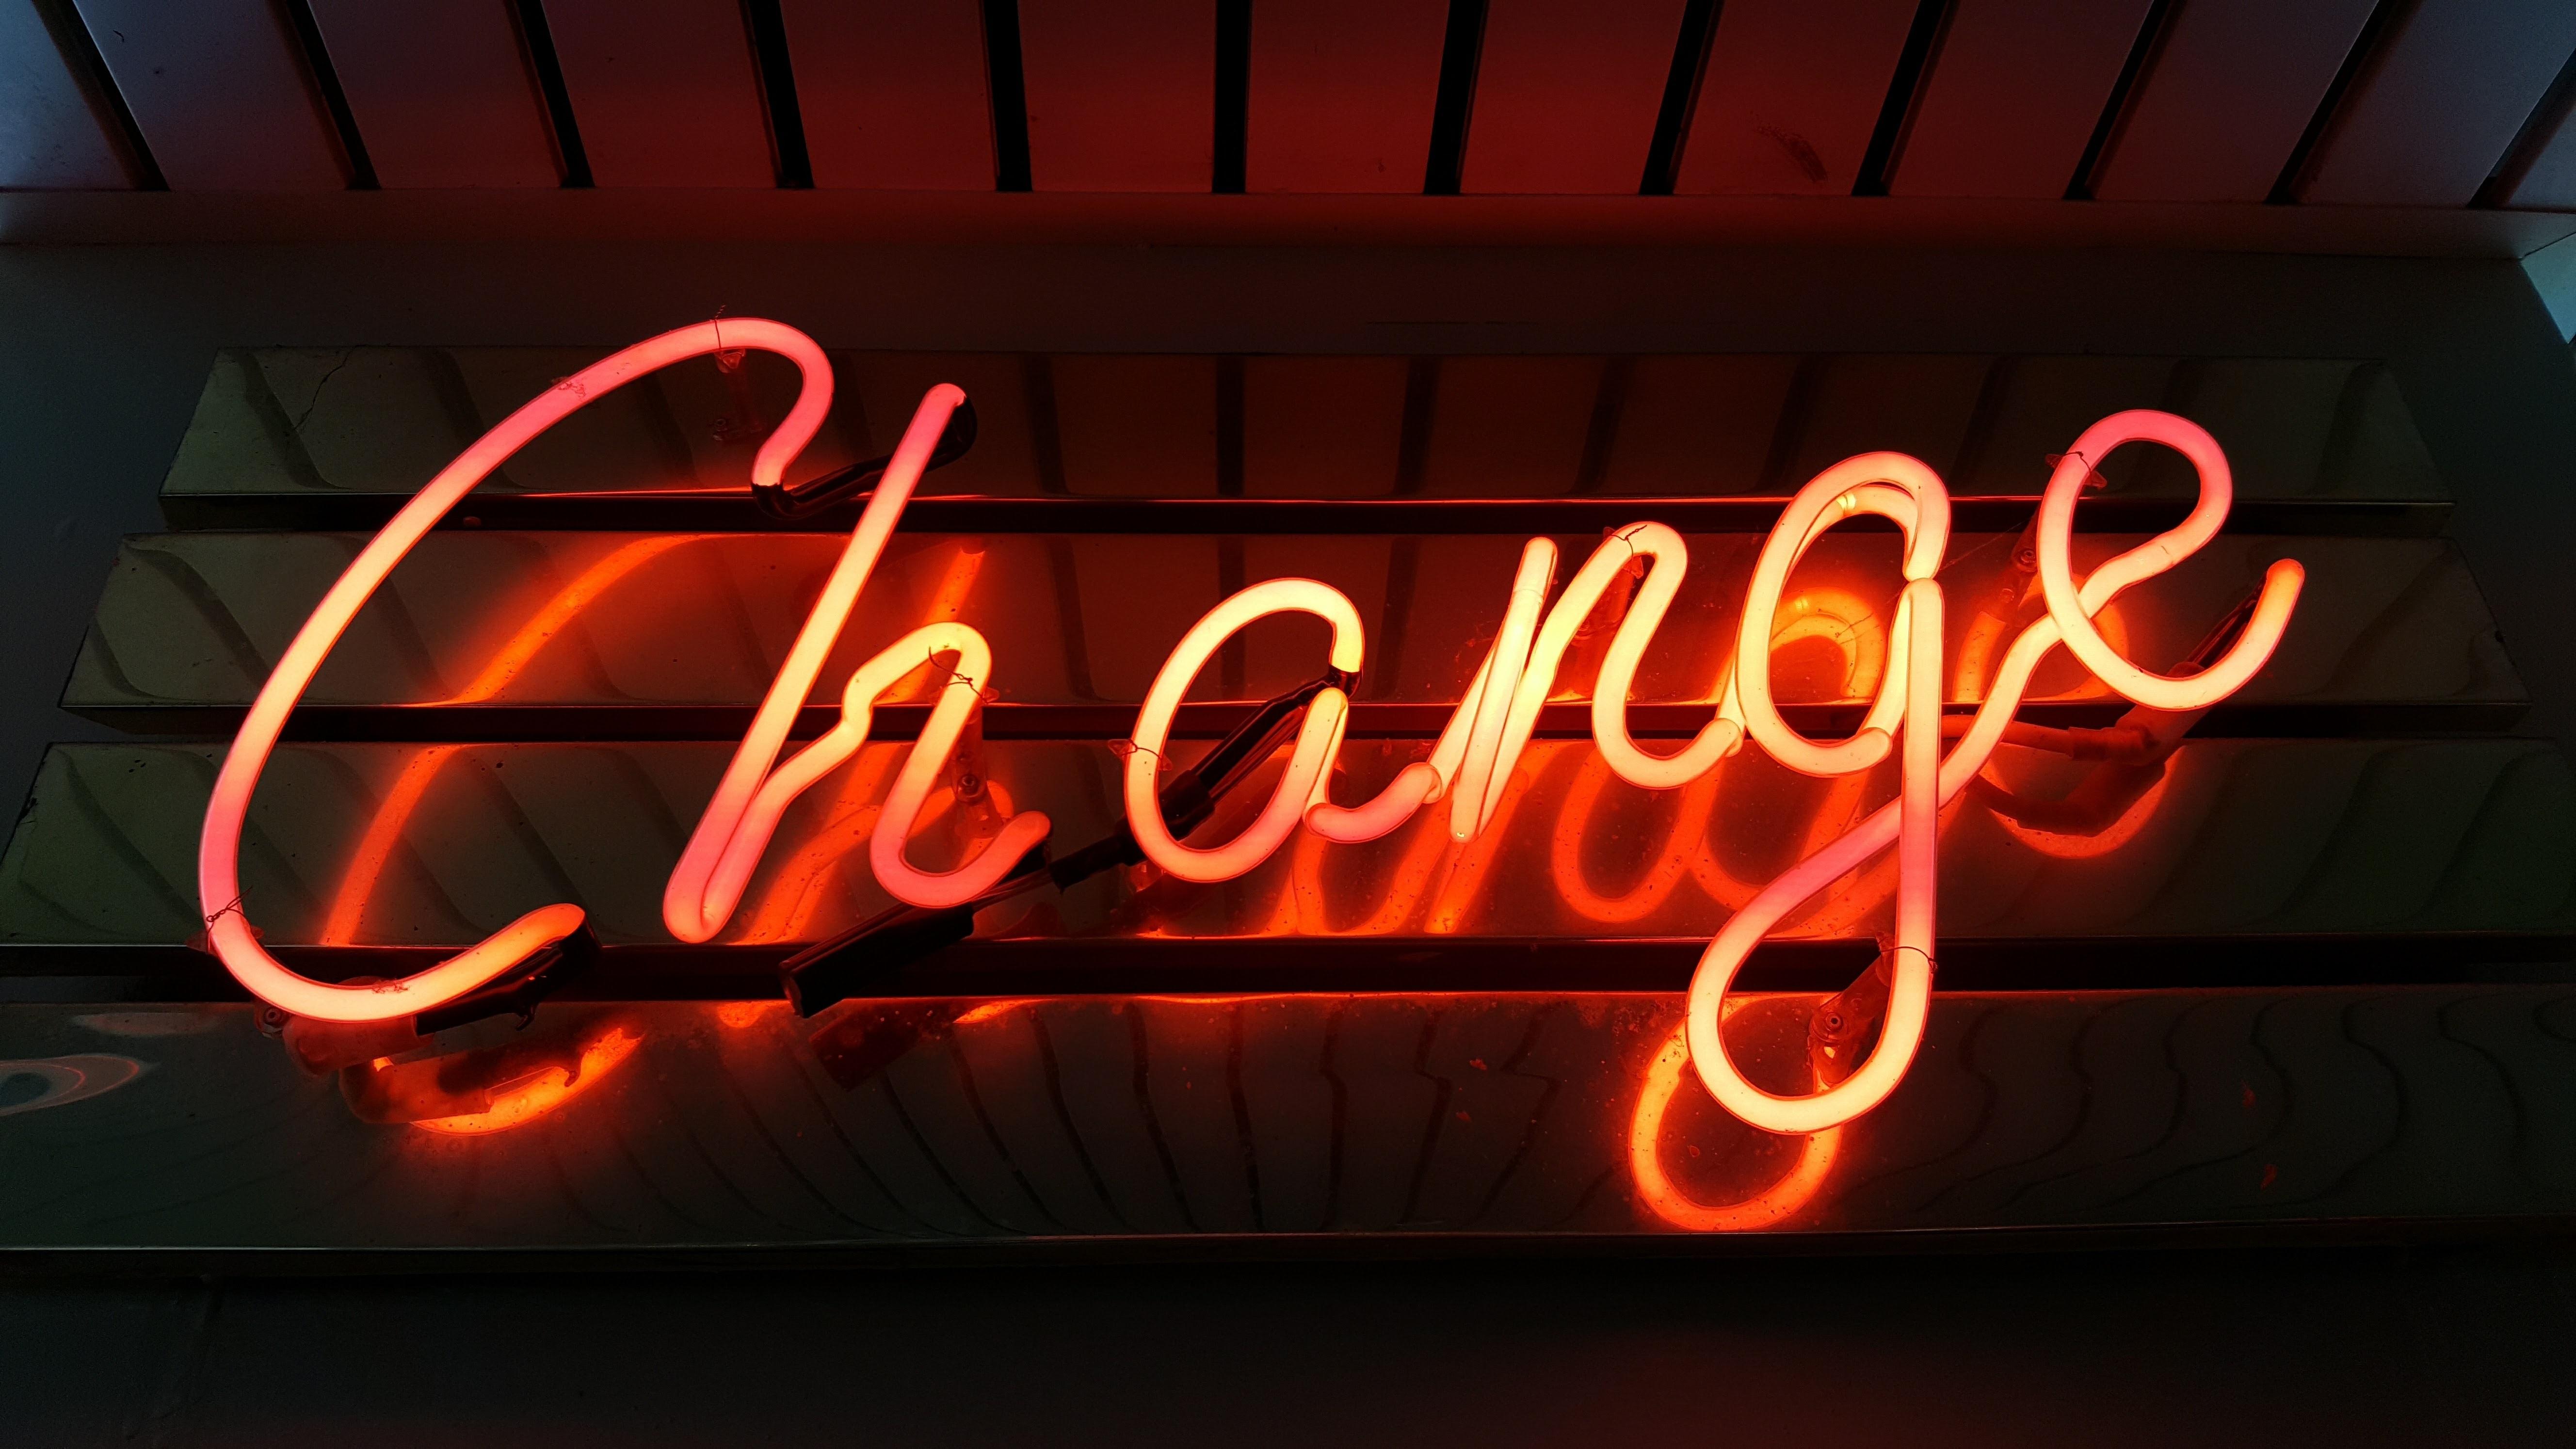 Transformational Change